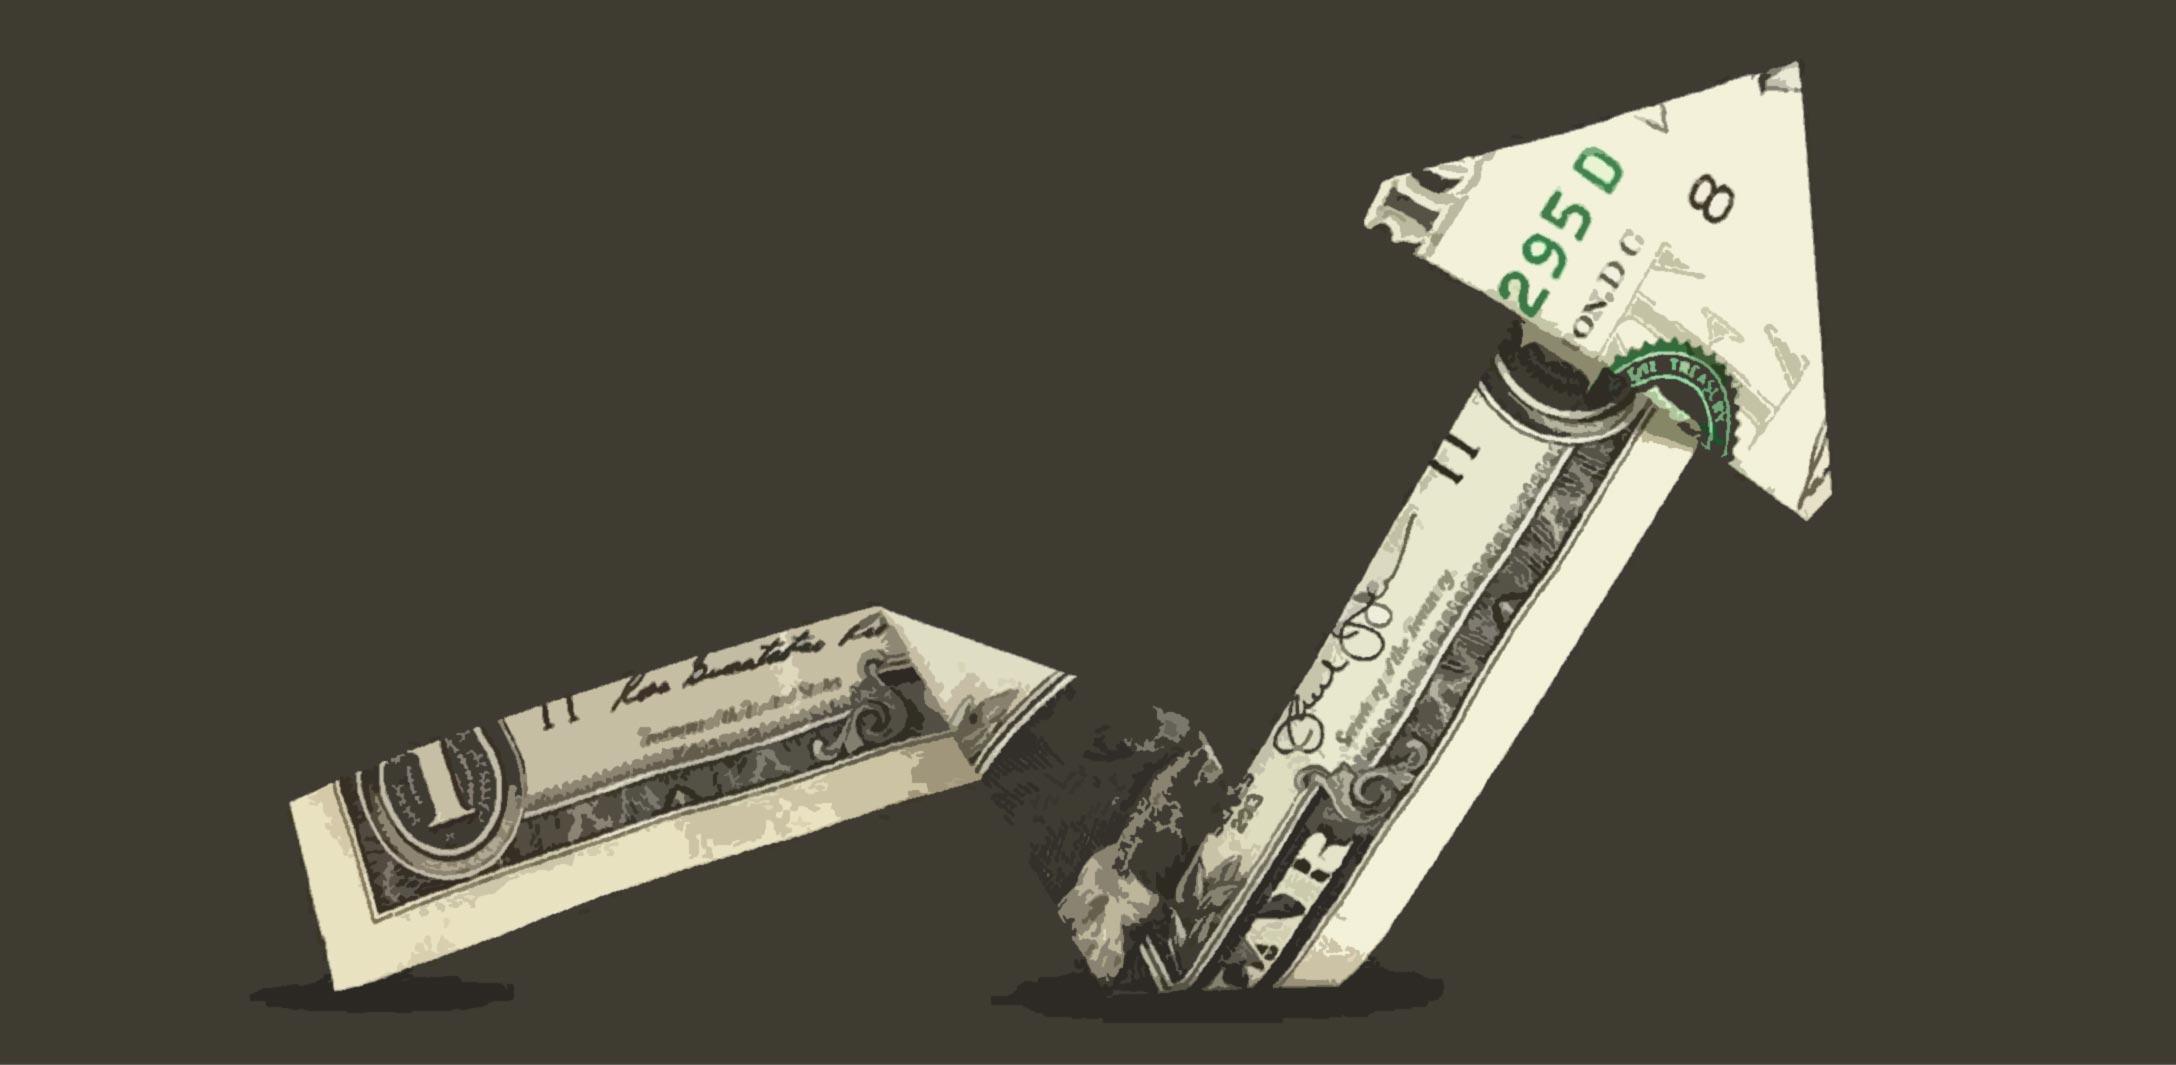 An arrow made from a folded dollar bill points upward.